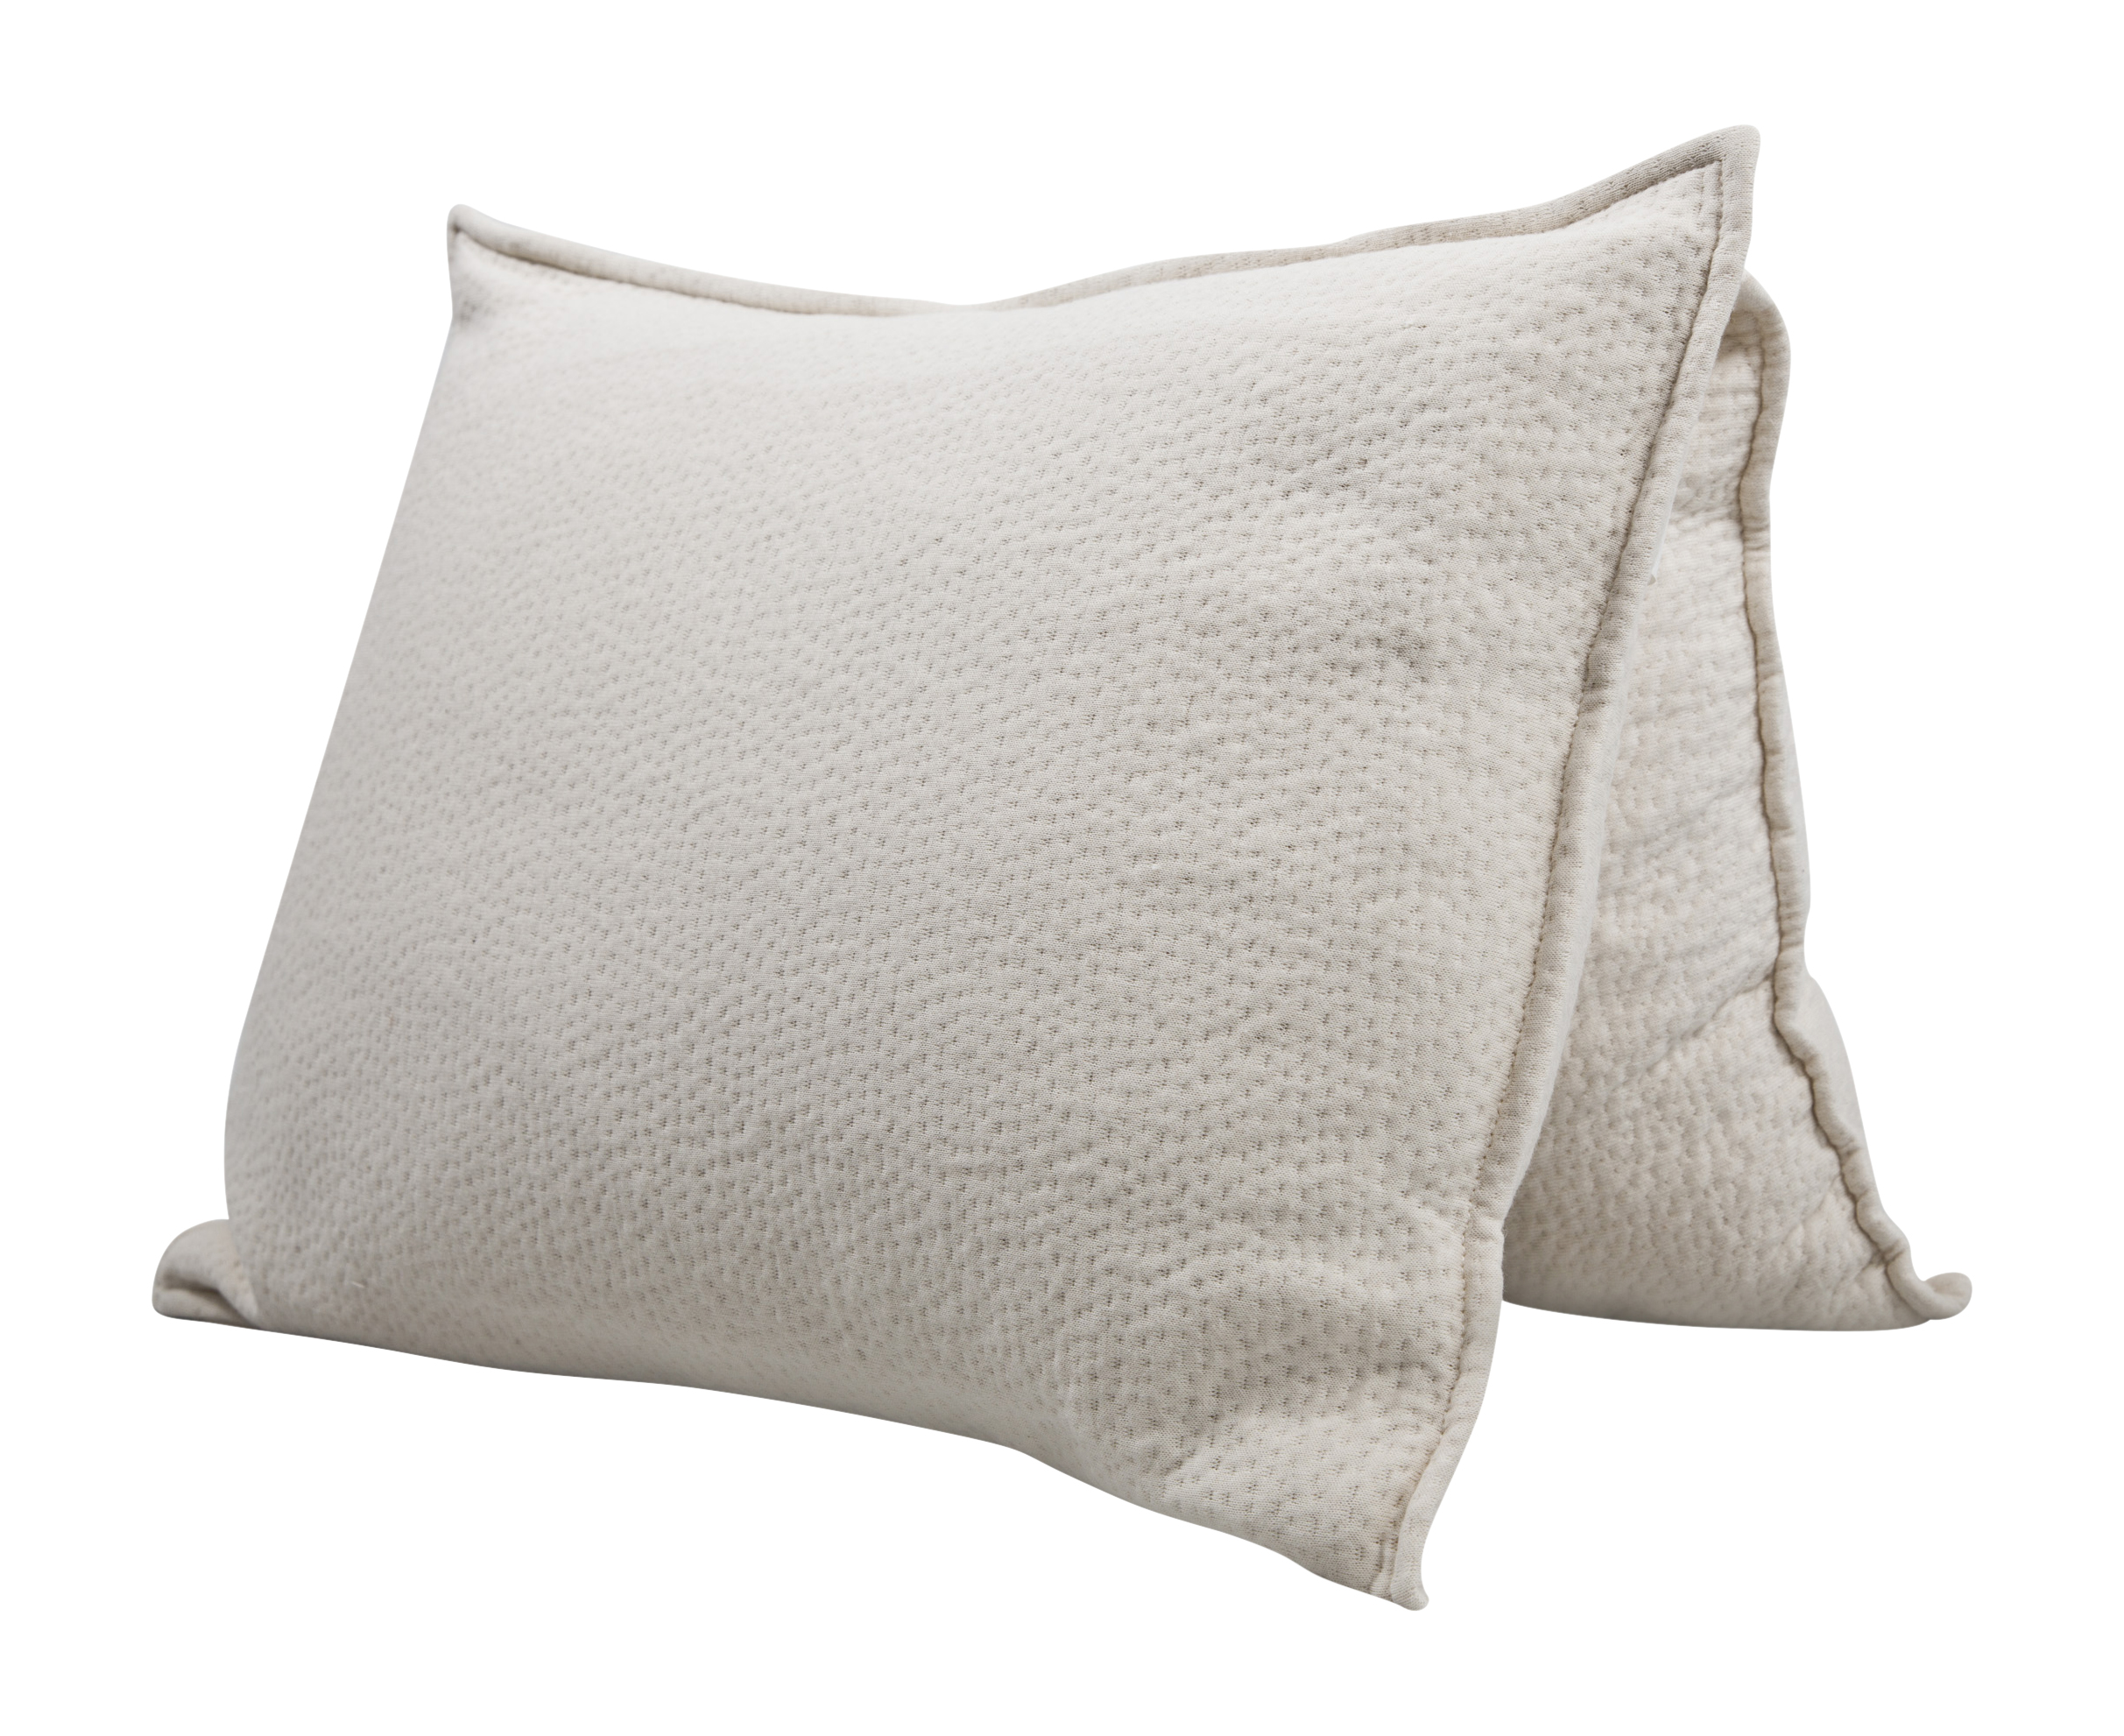 oreillernatura product usa pillow information organiclatex organic additional us interieur natura latex